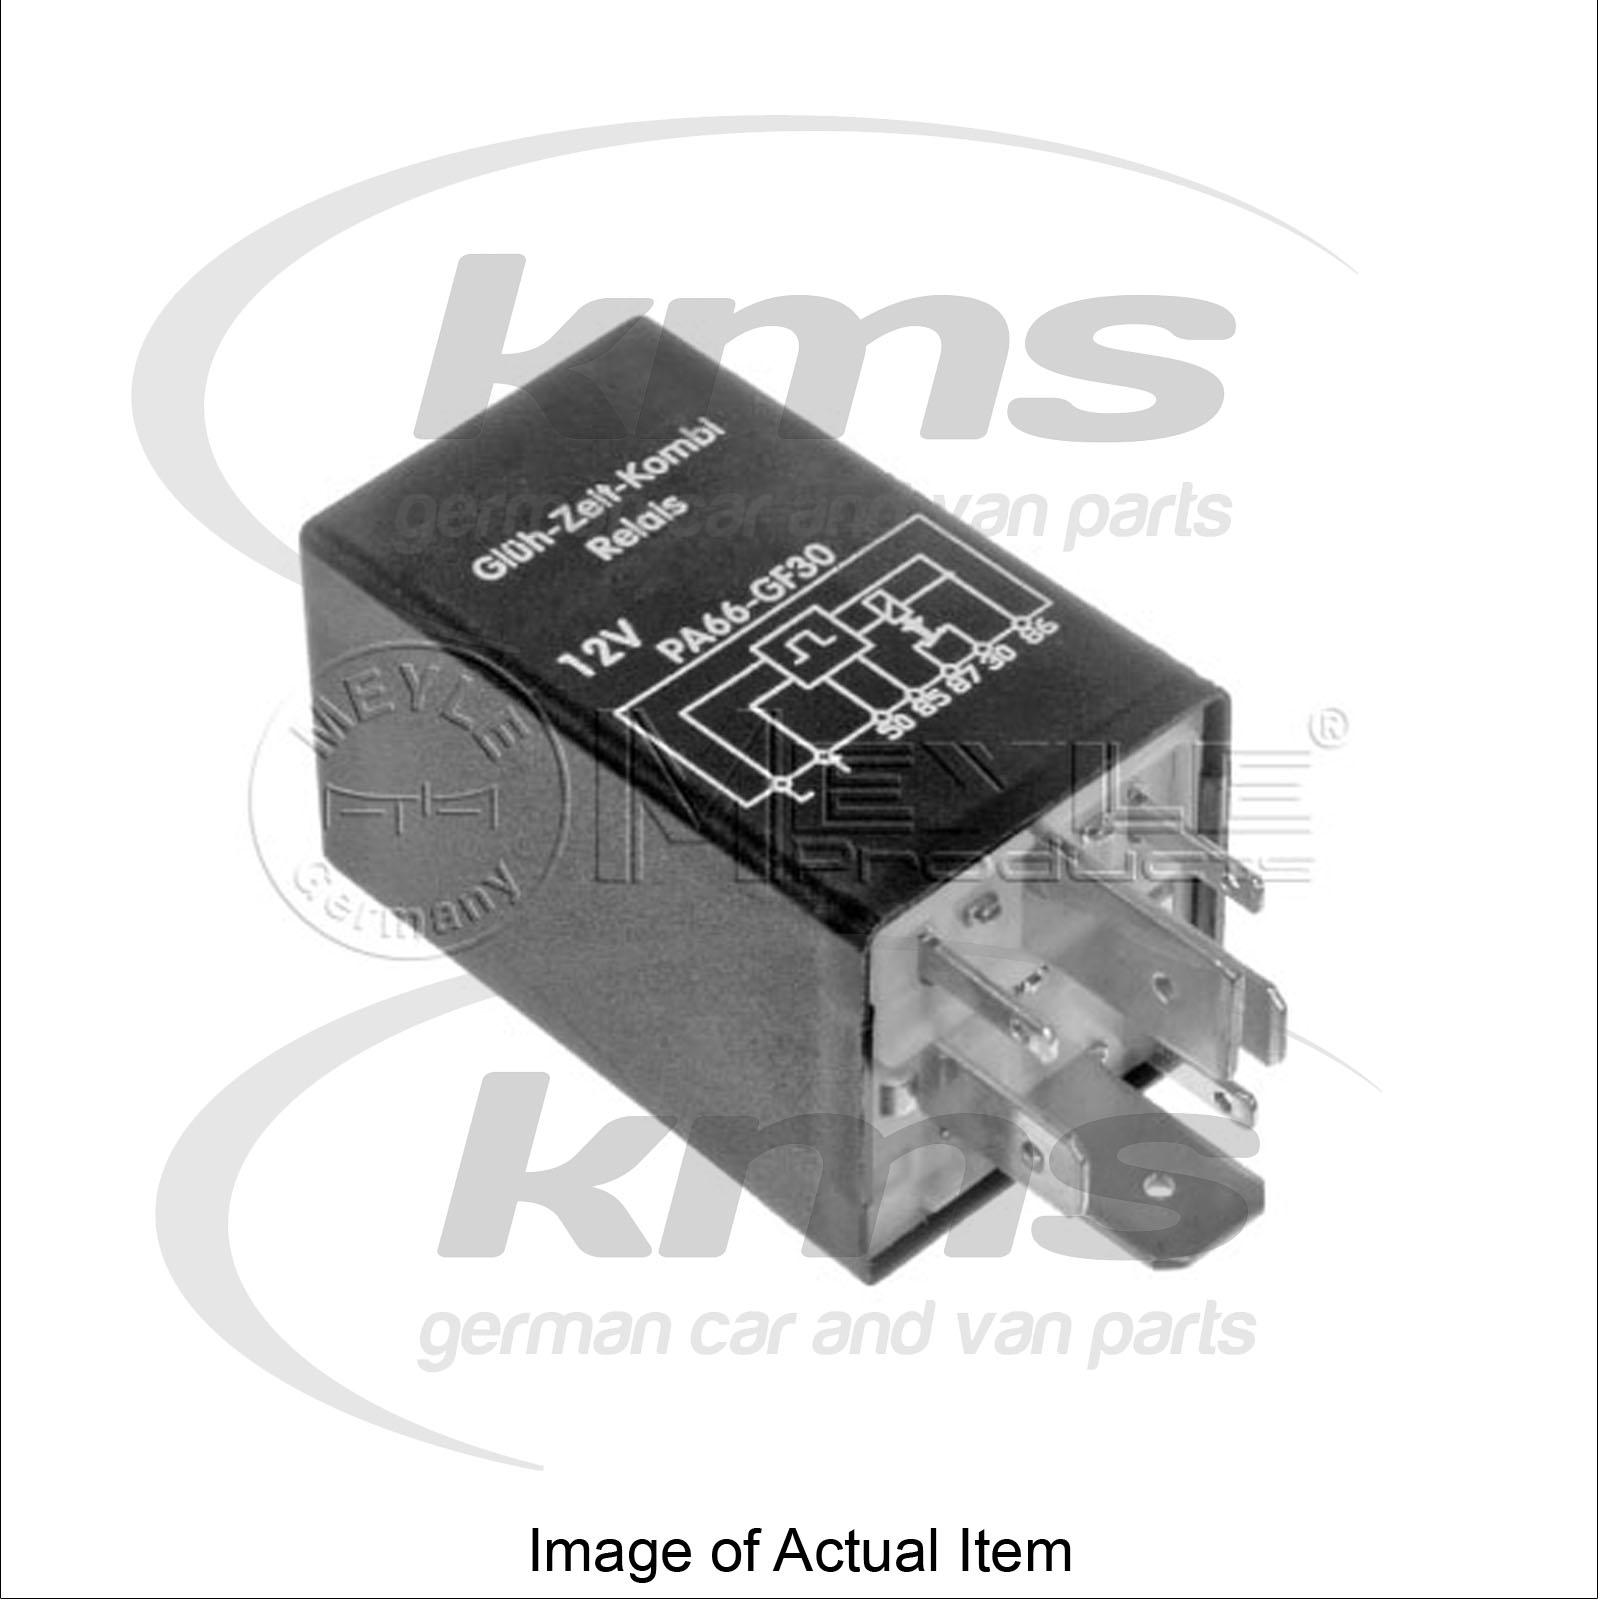 2003 expedition fuse box relay location vwt4 2 5tdi glowplug relay location relay for glow plug system vw transporter t4 box 70xa 2